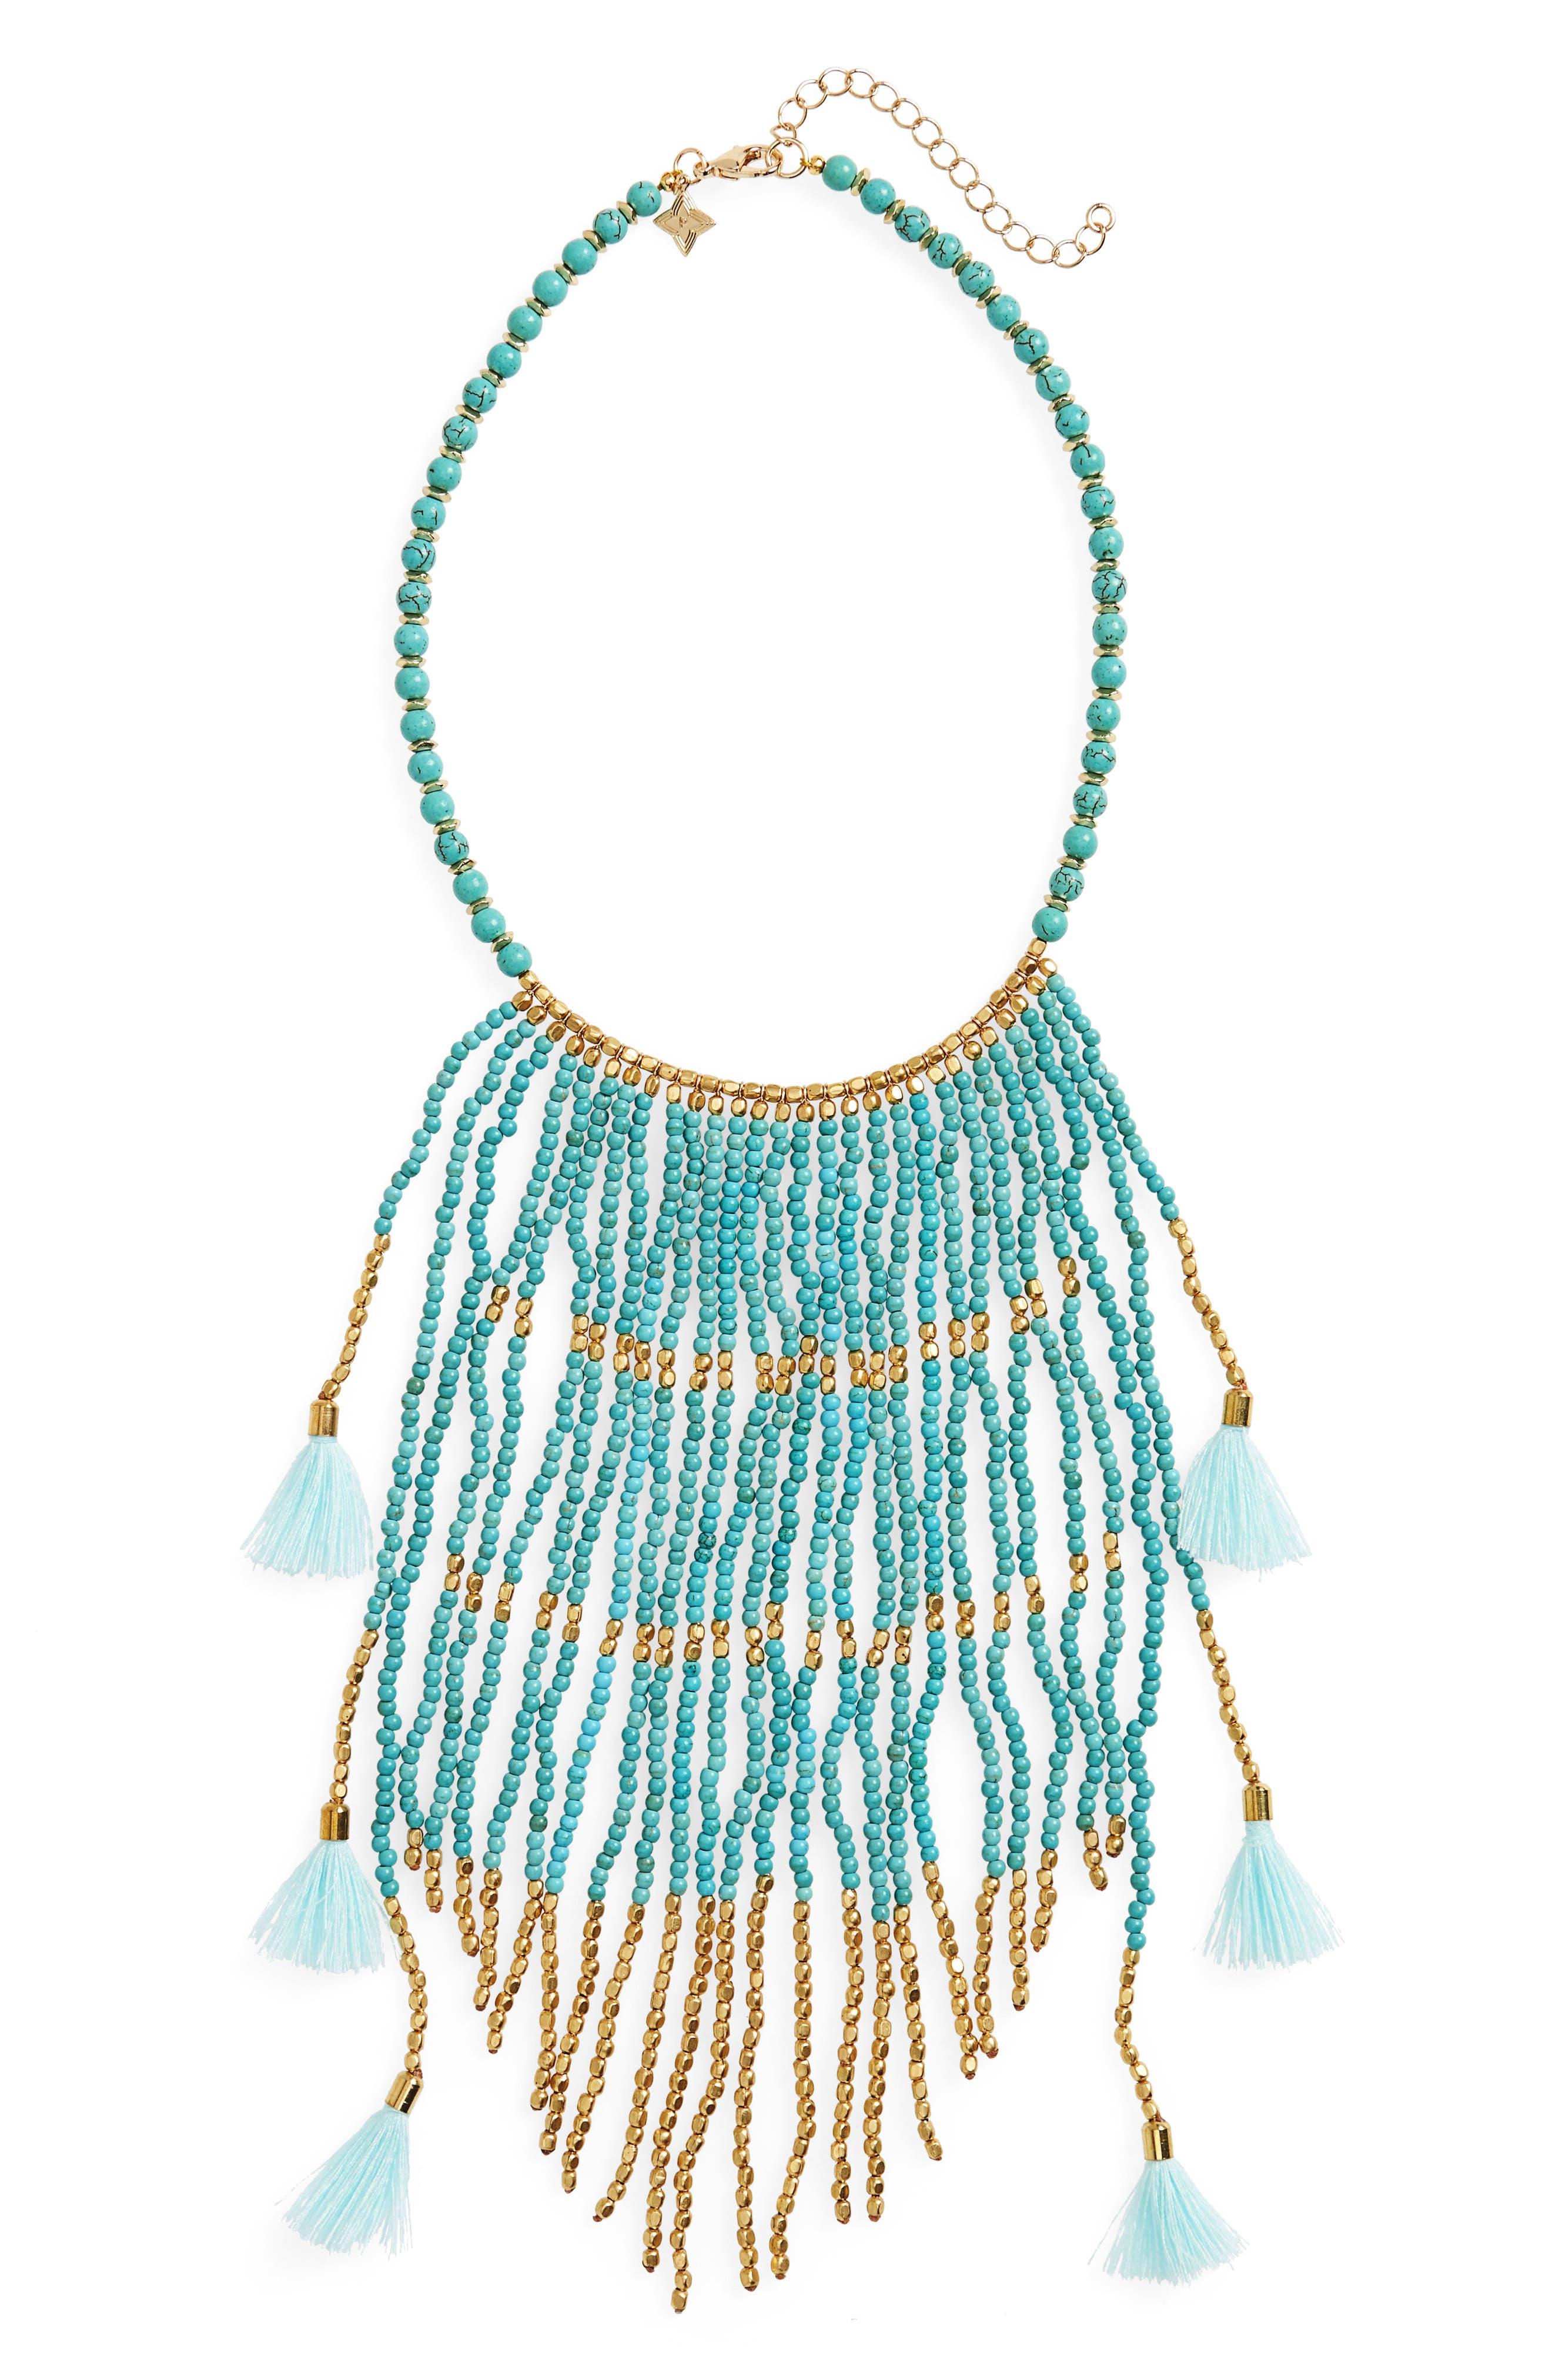 Beaded Fringe Statement Necklace,                             Main thumbnail 1, color,                             Turquoise